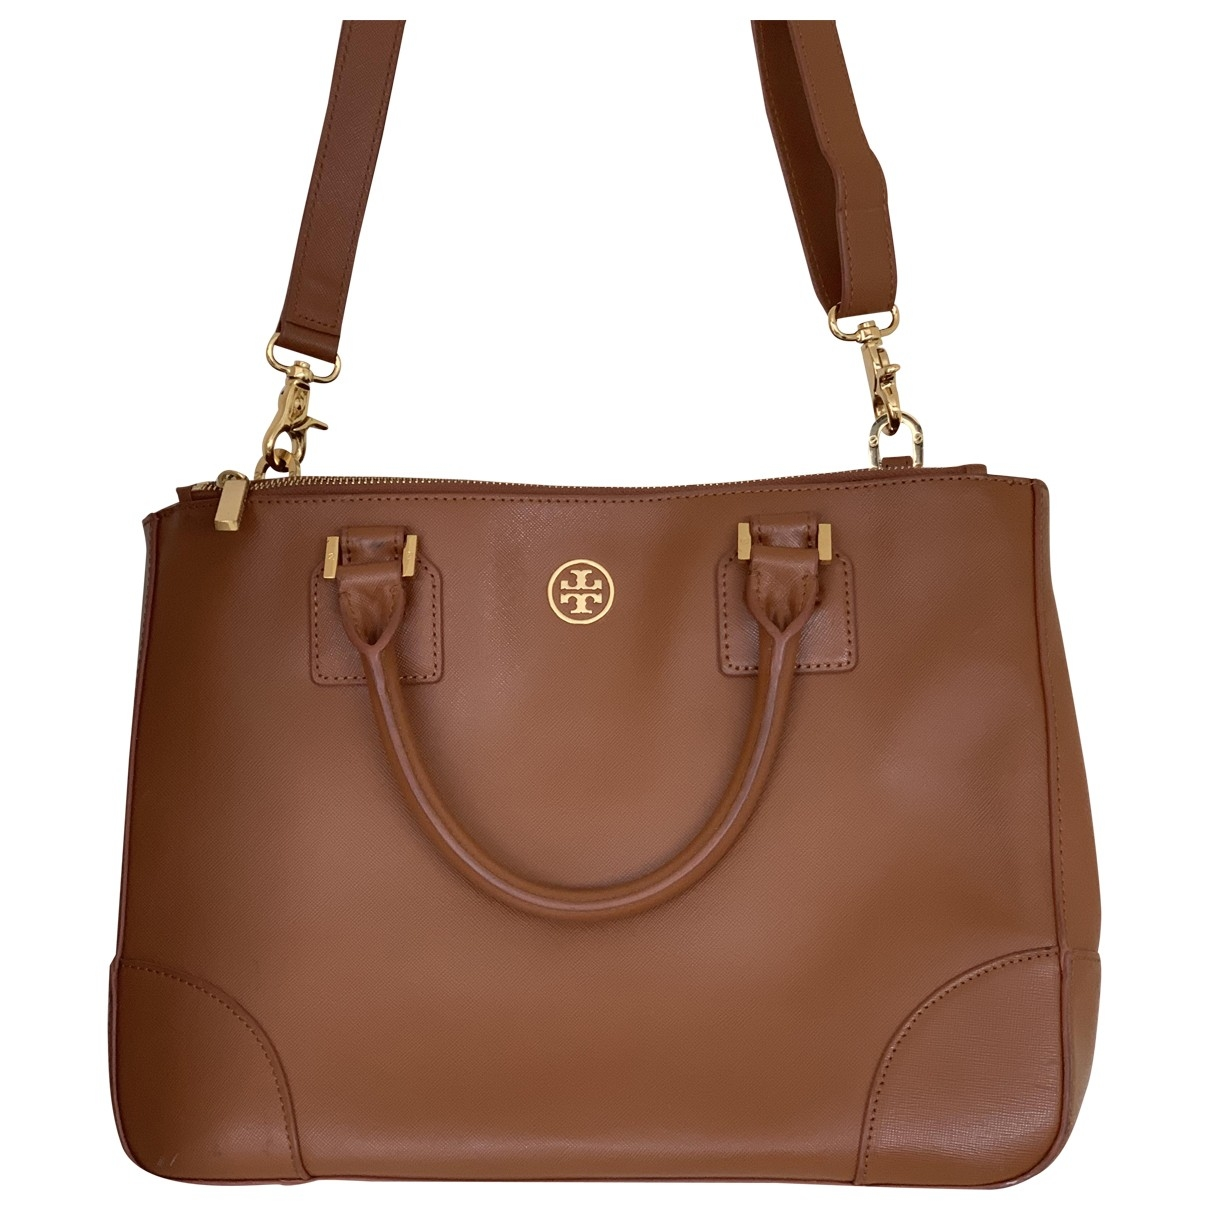 Tory Burch \N Camel handbag for Women \N